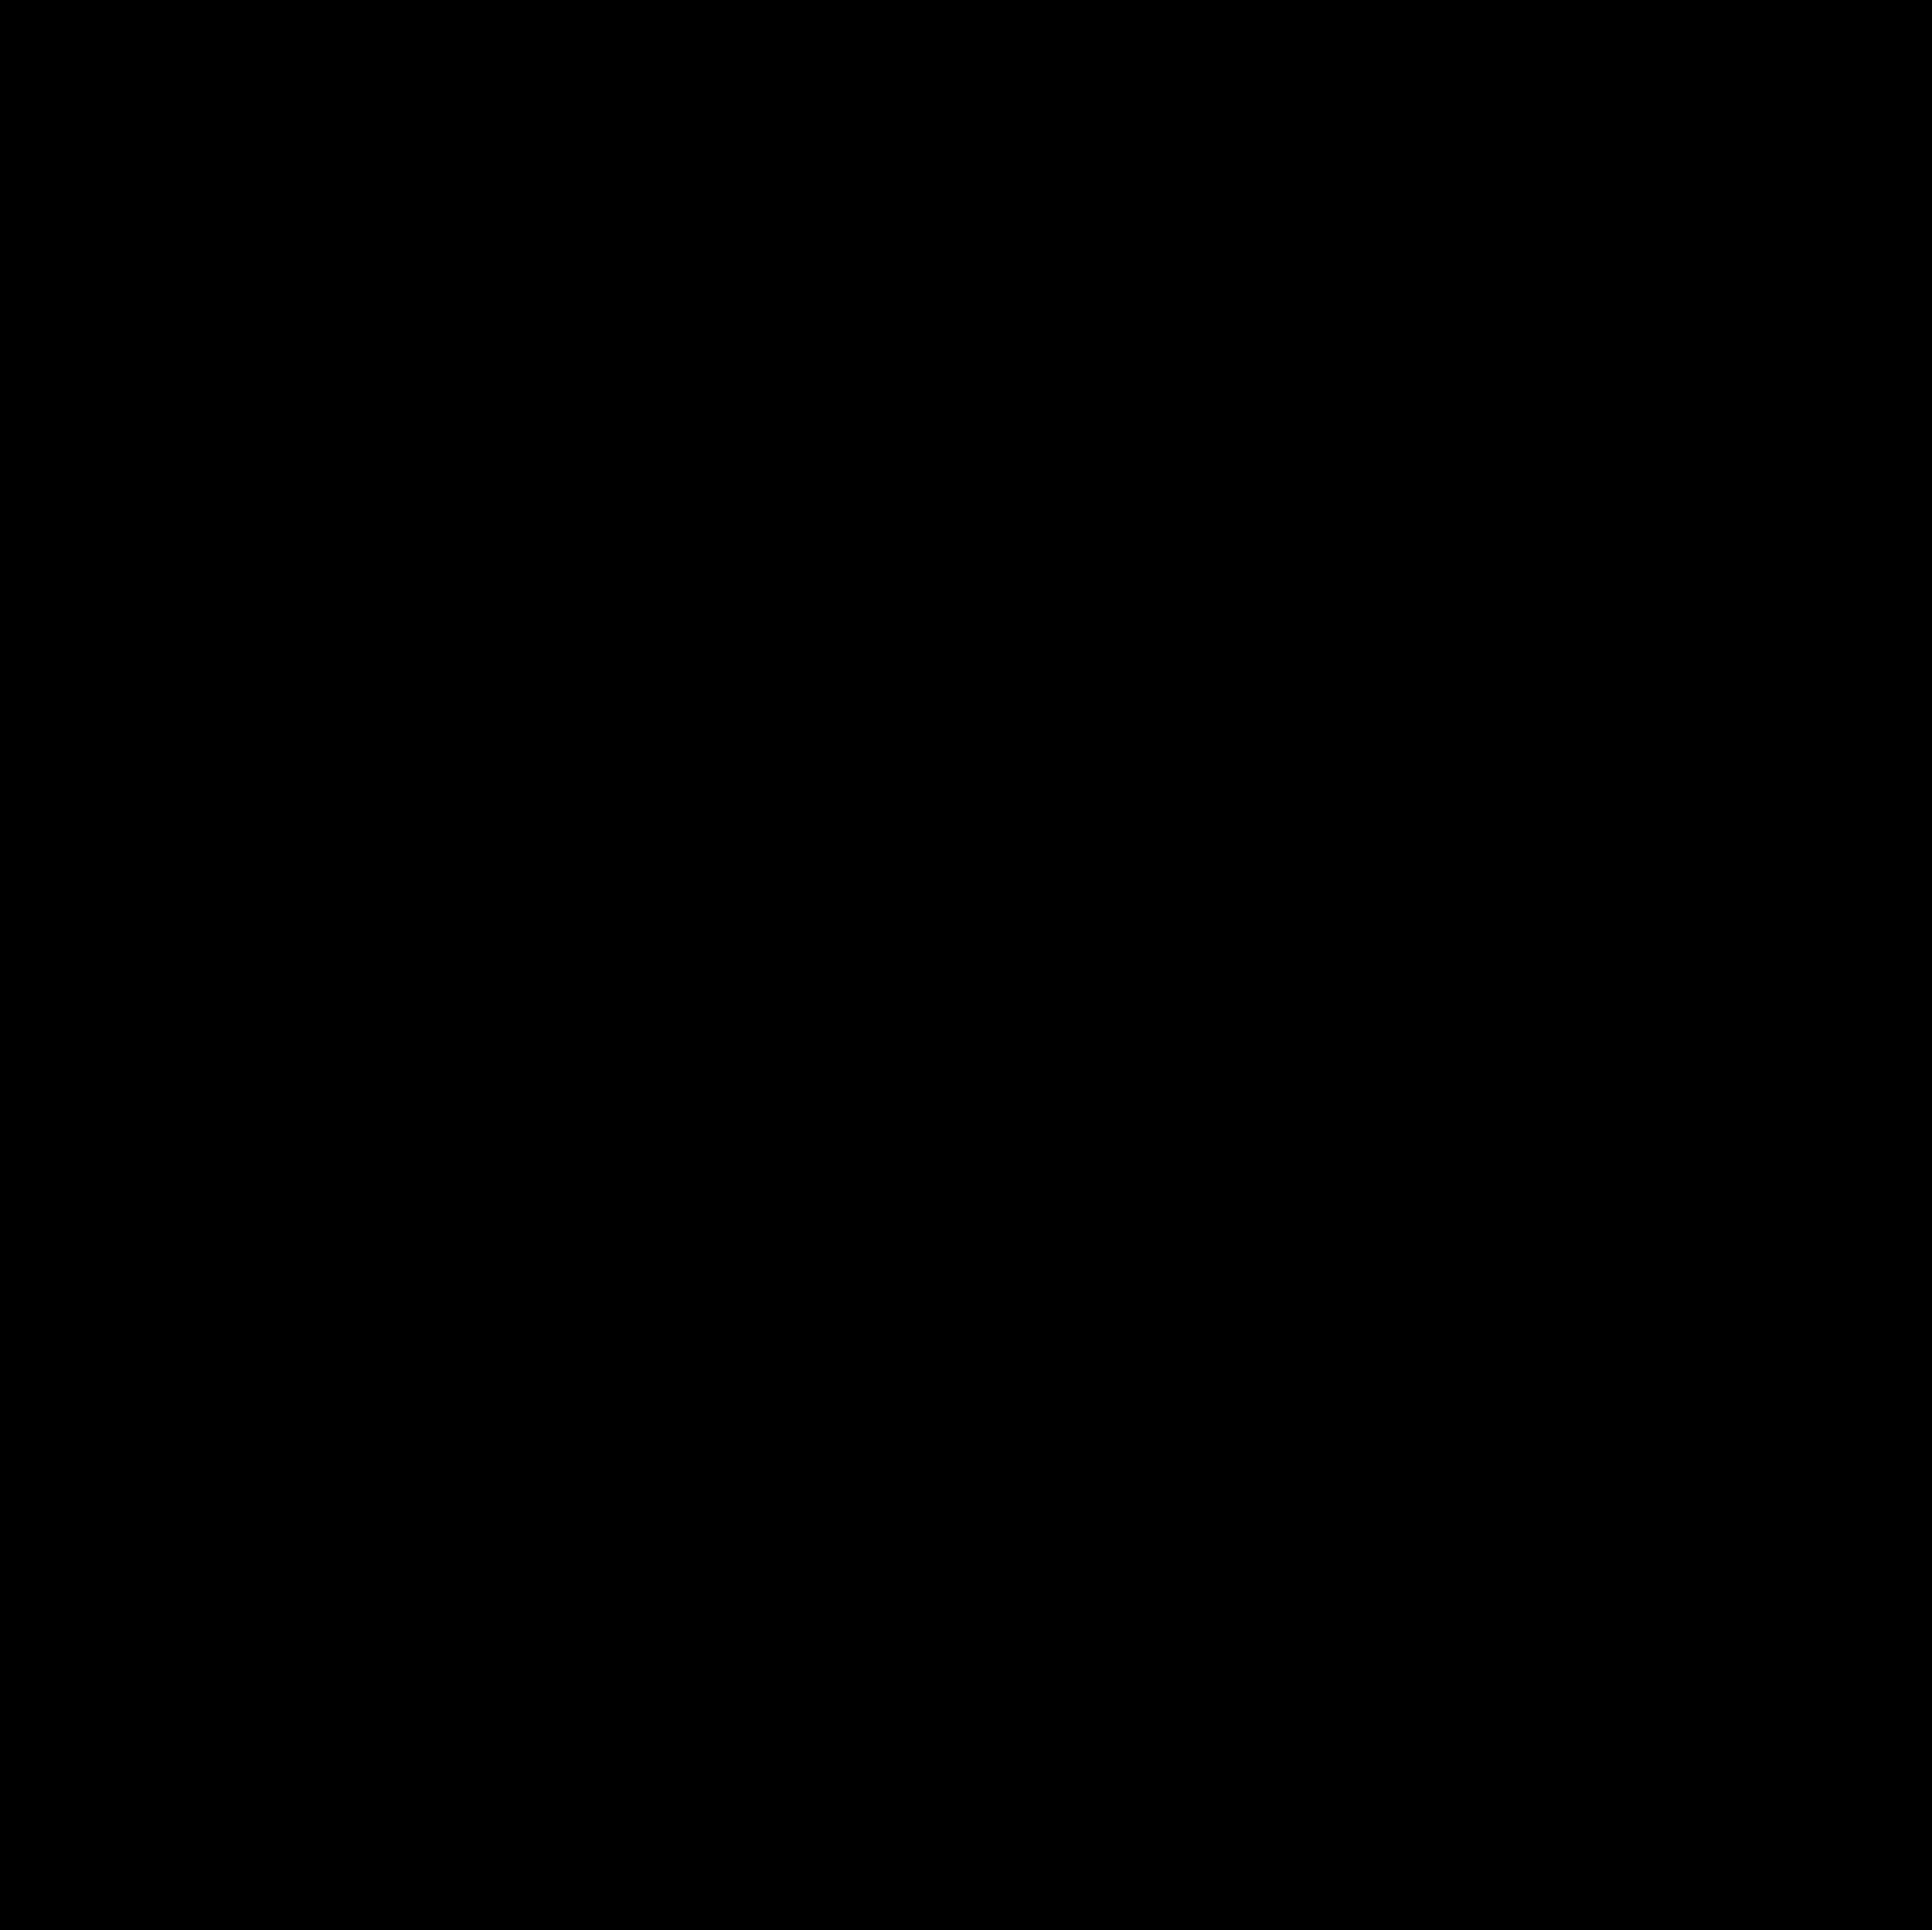 2403x2400 Clipart